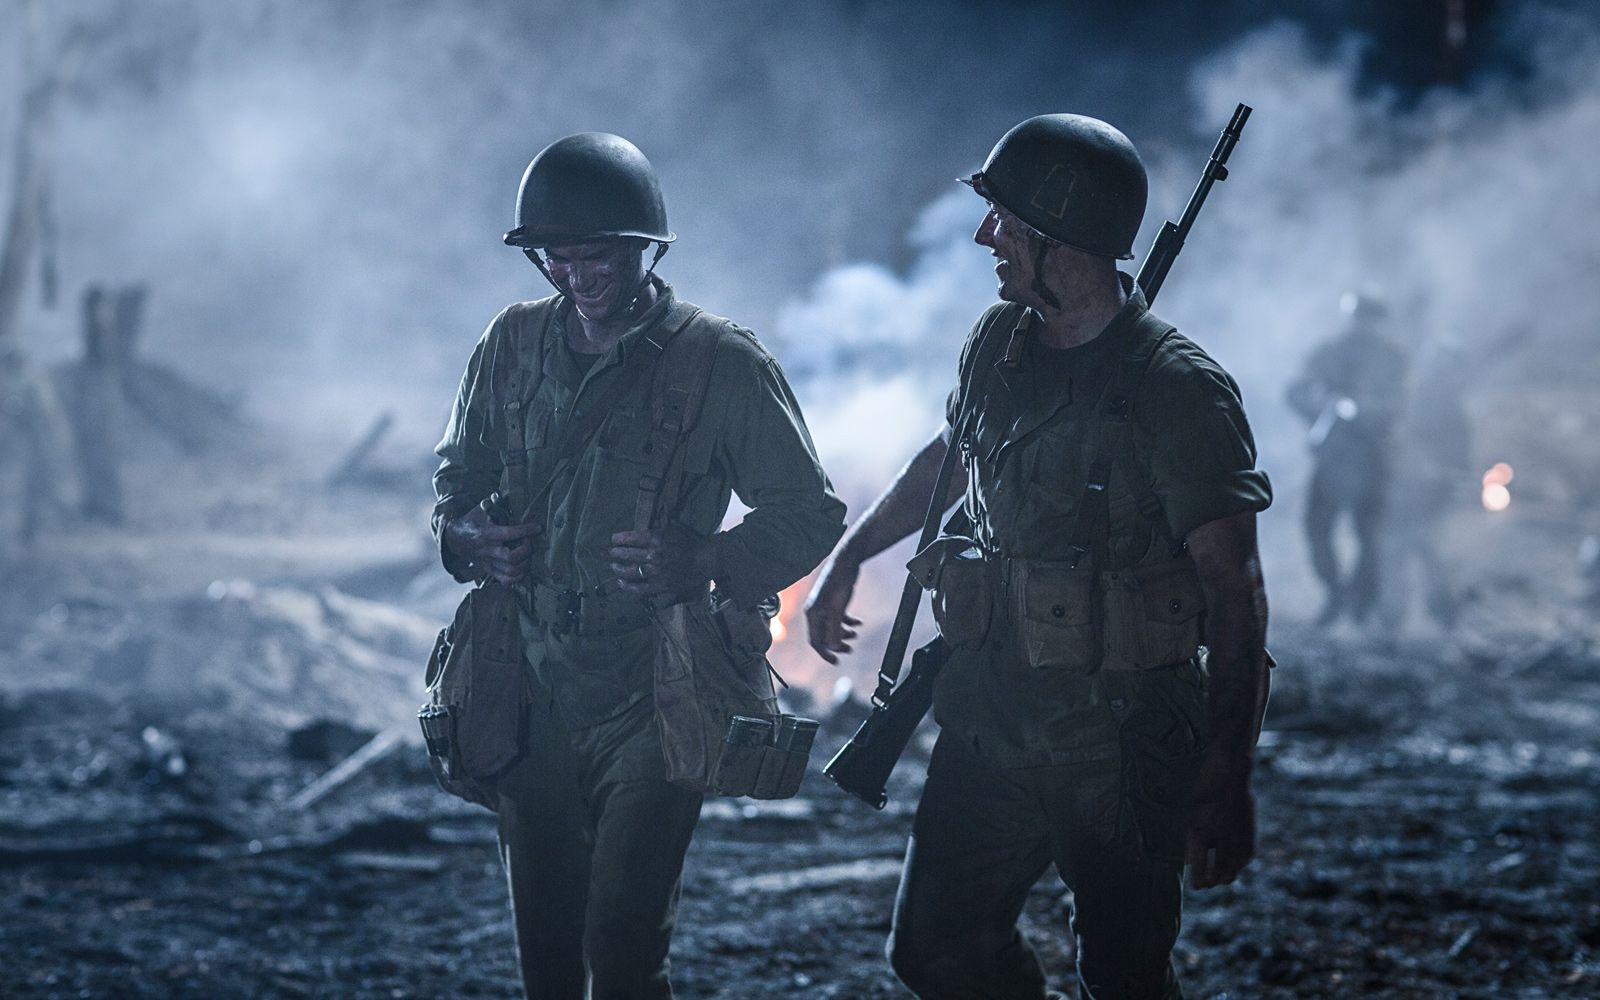 World War II Soldiers   Andrew Garfield in Hacksaw Ridge